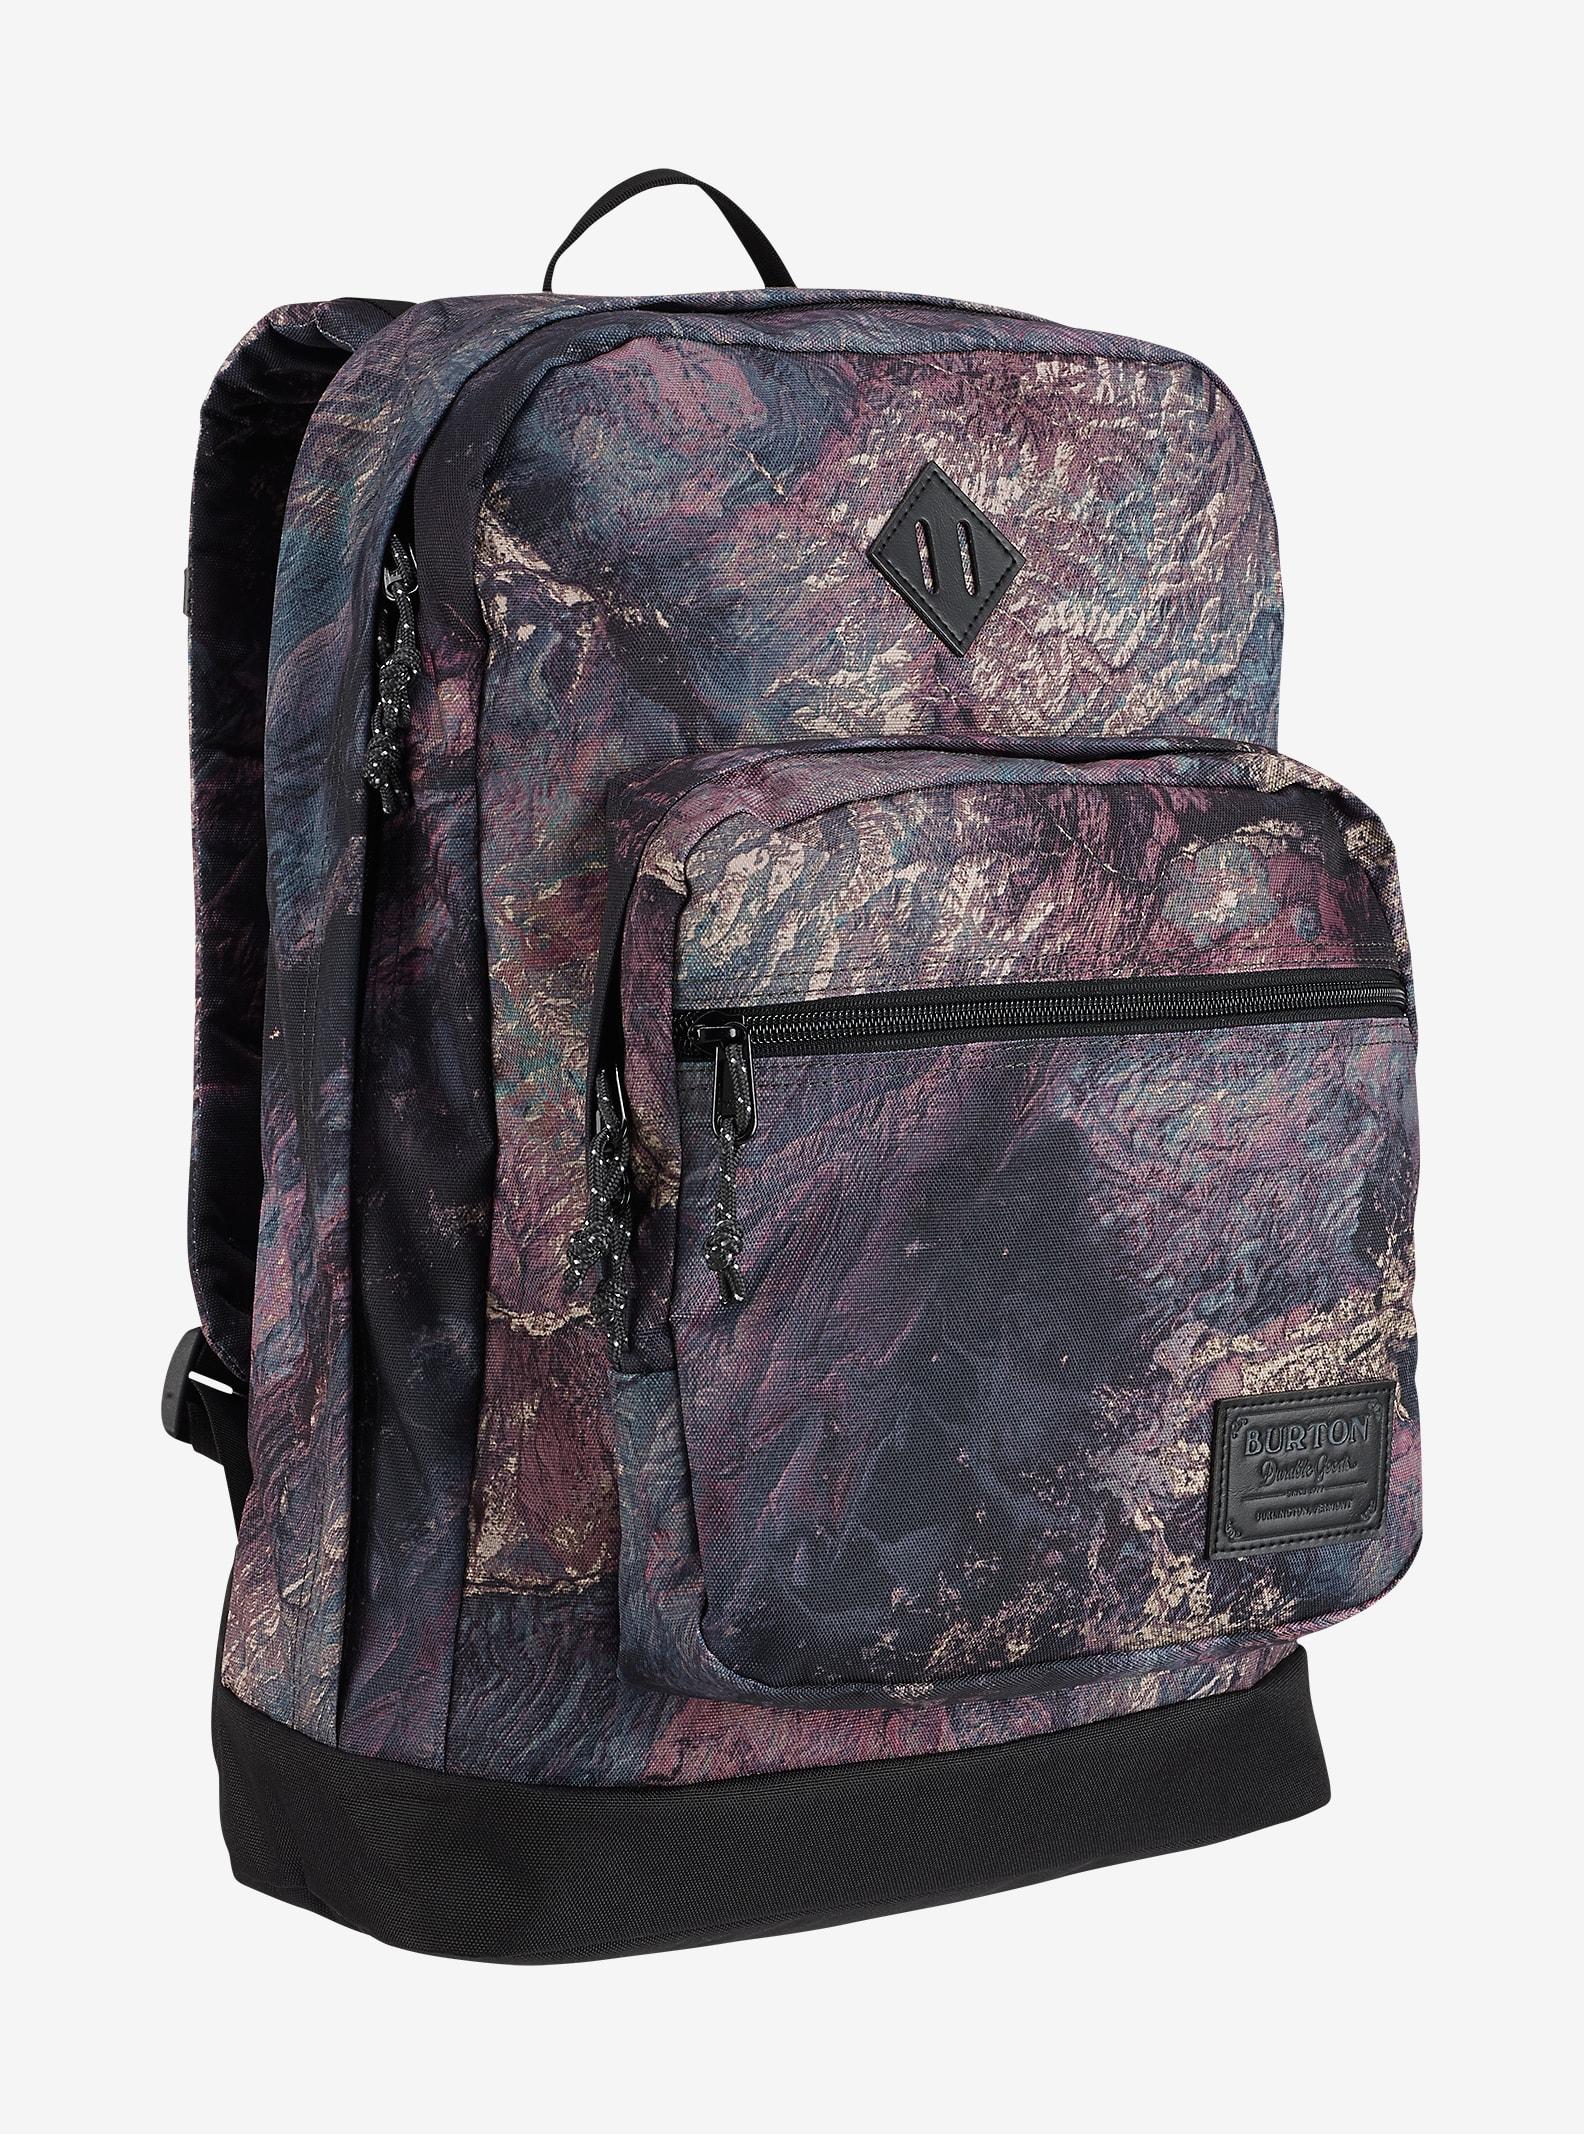 Burton Big Kettle Backpack shown in Earth Print